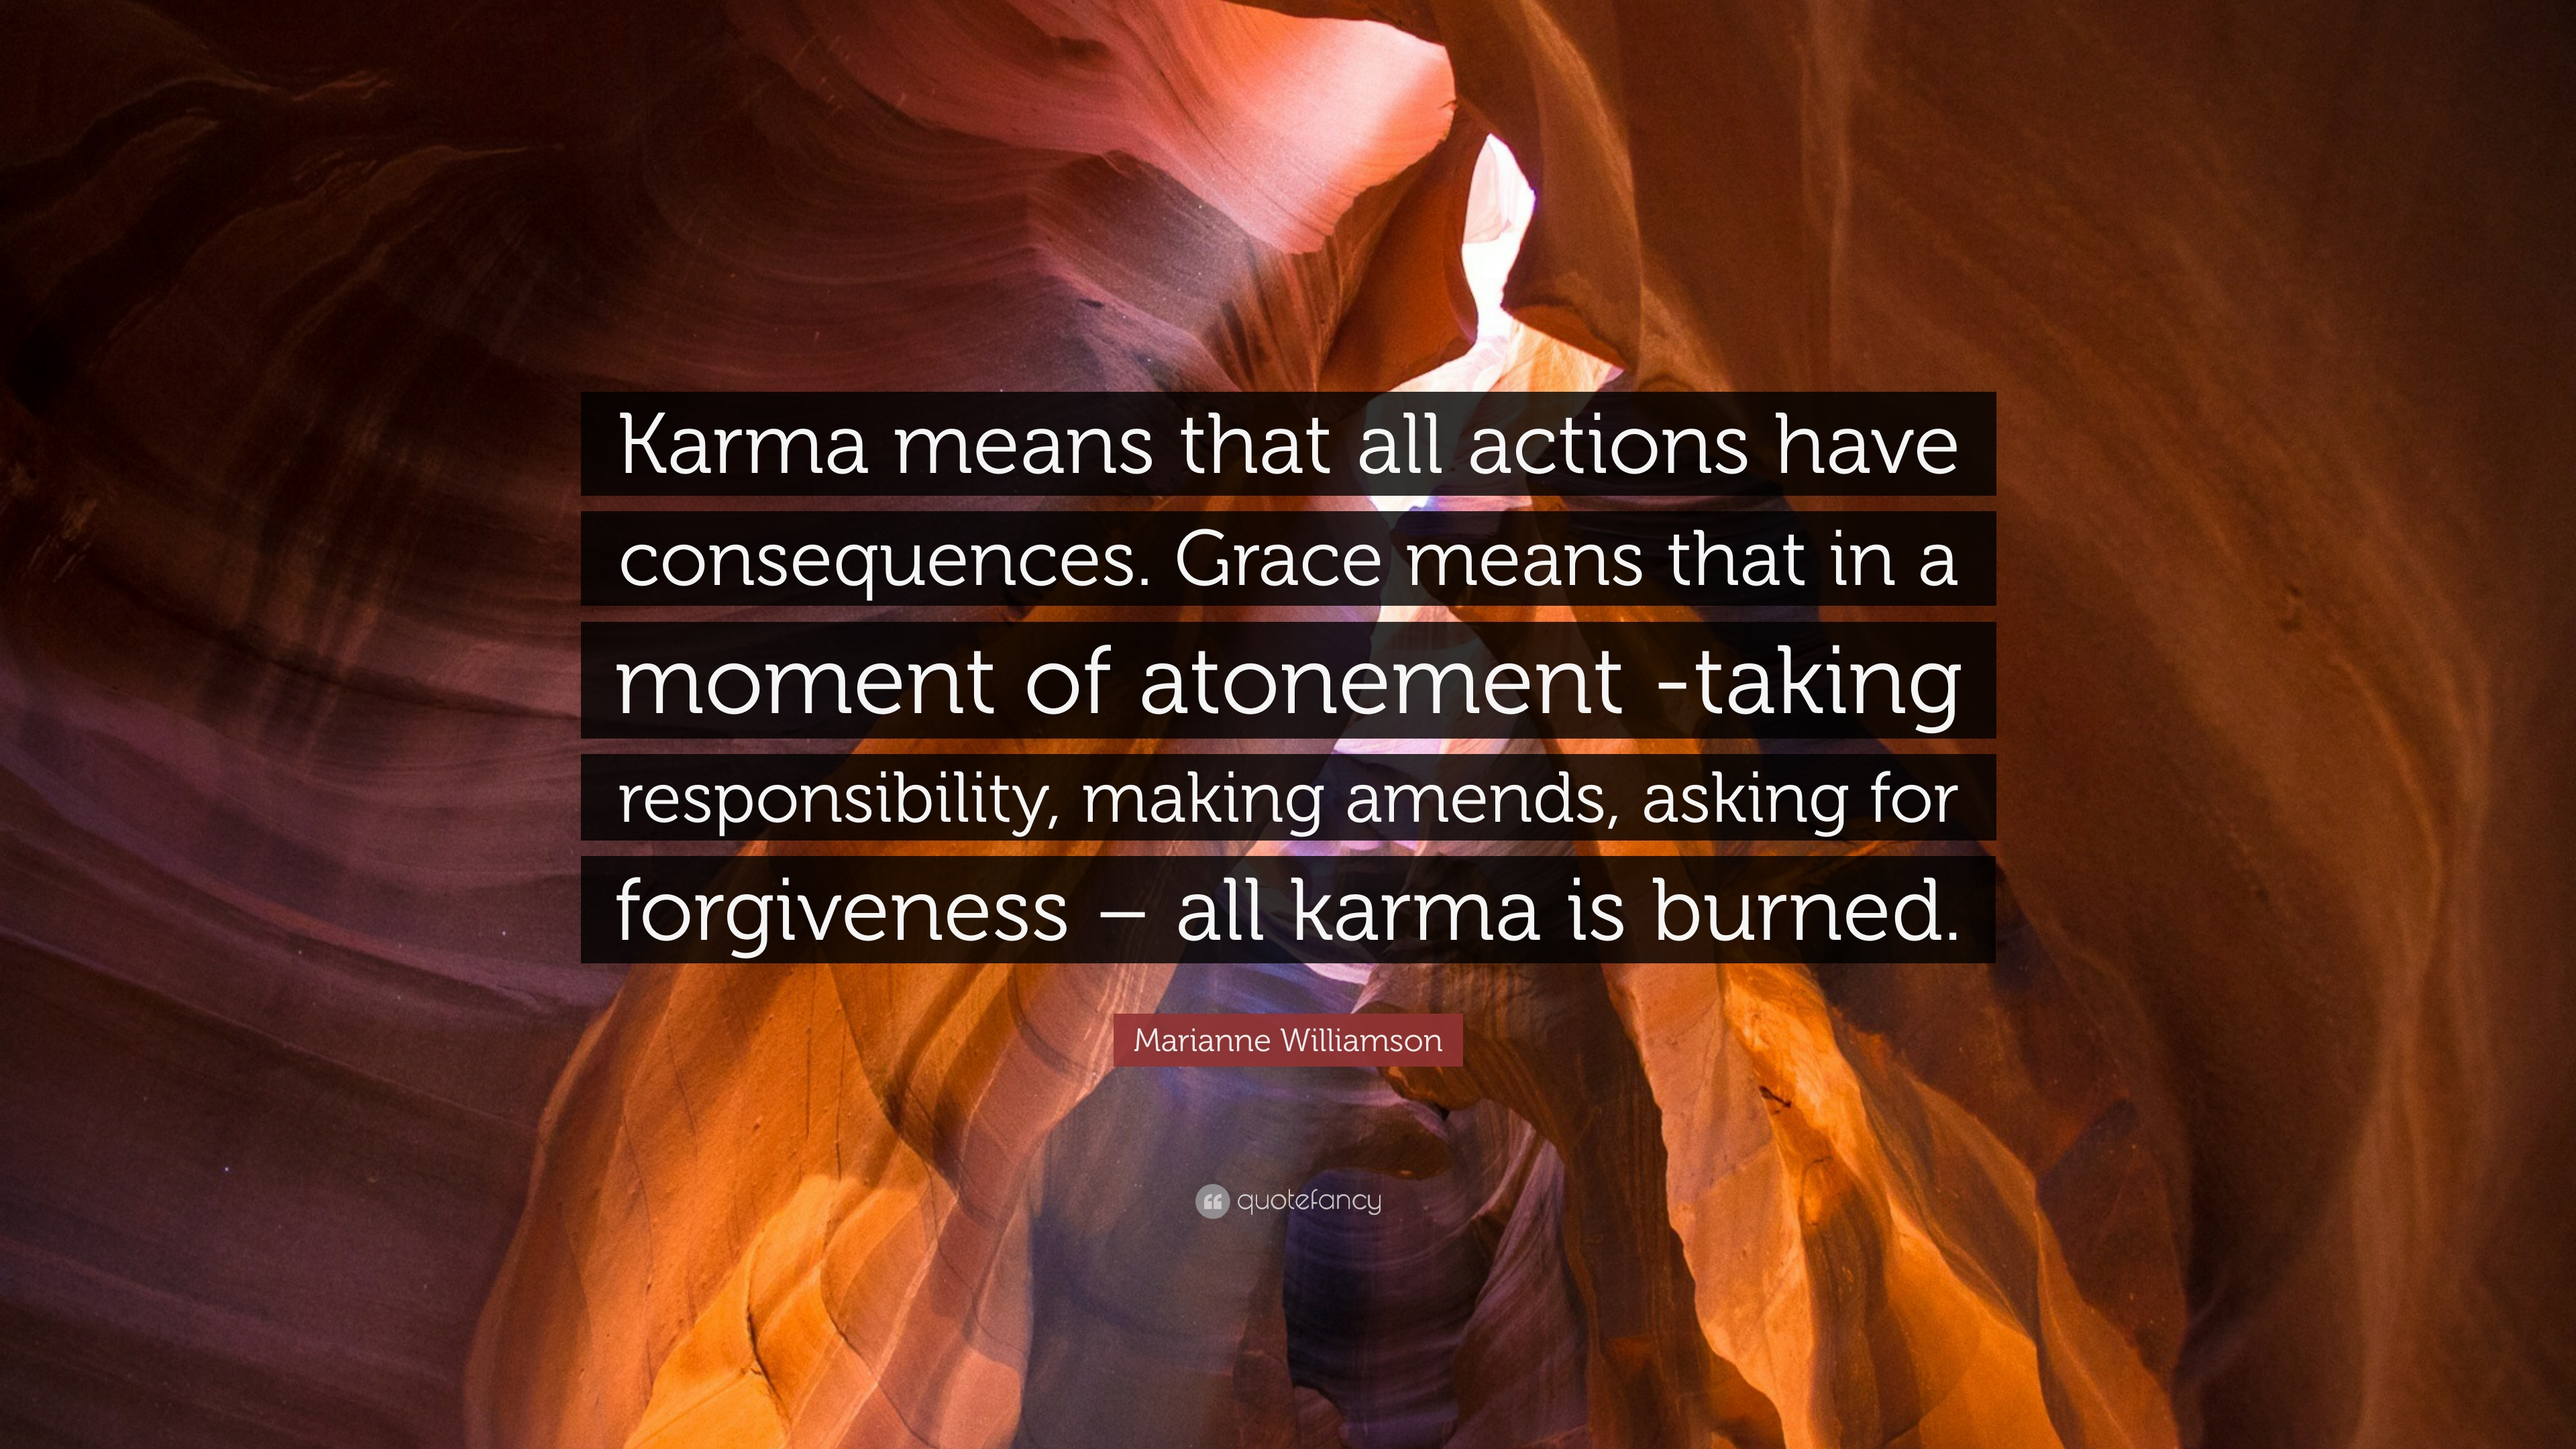 Rewrite Assignments: Essay On Karma